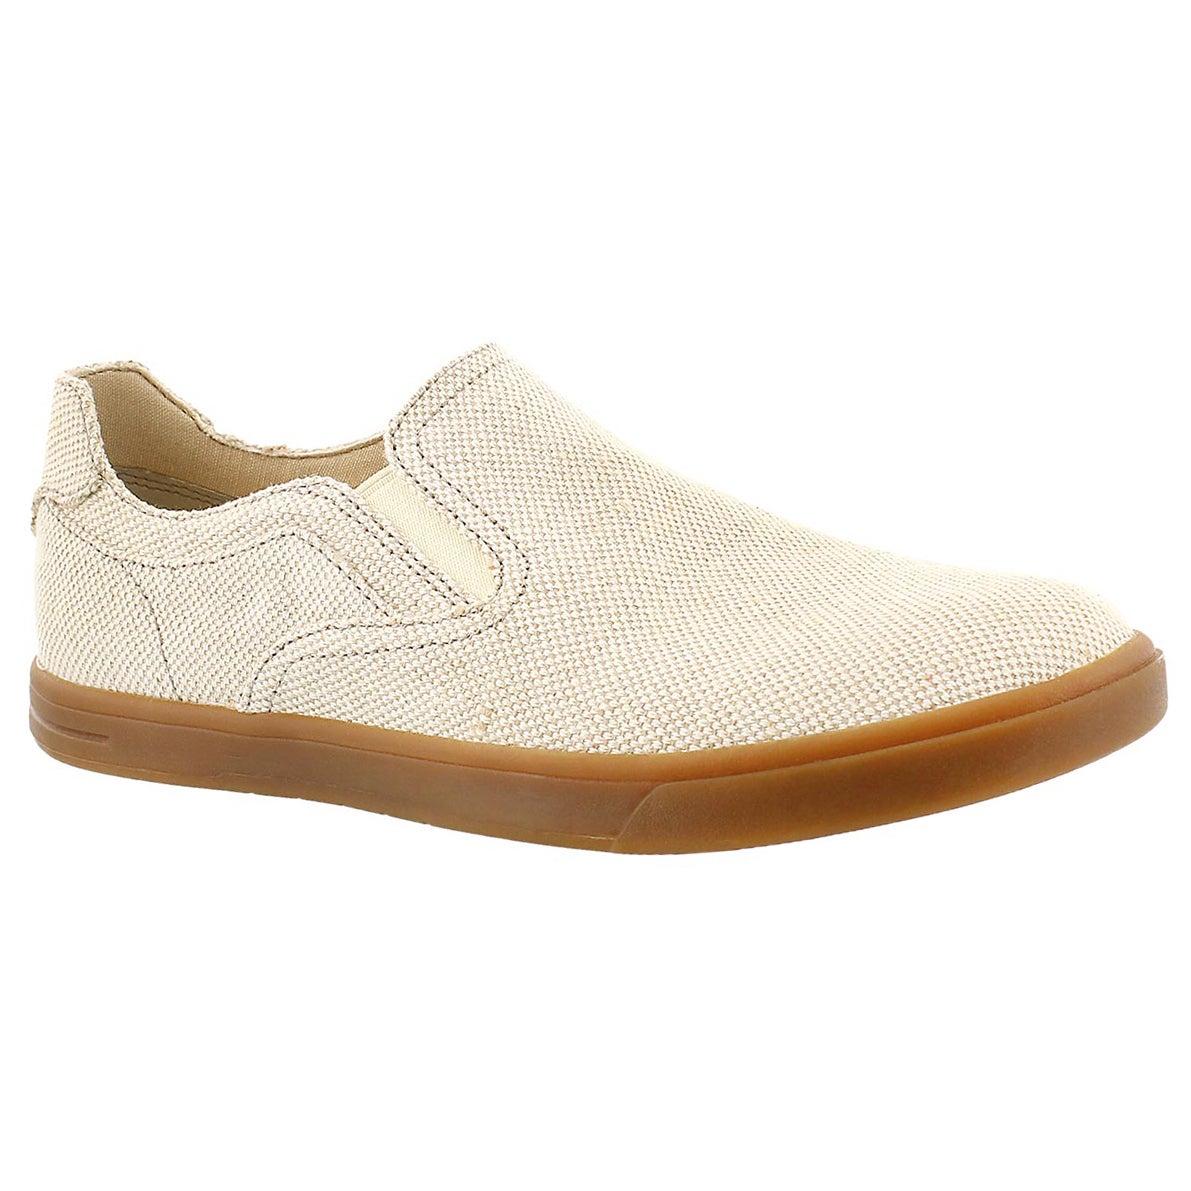 Mns Tobin Canvas sand slip on shoe